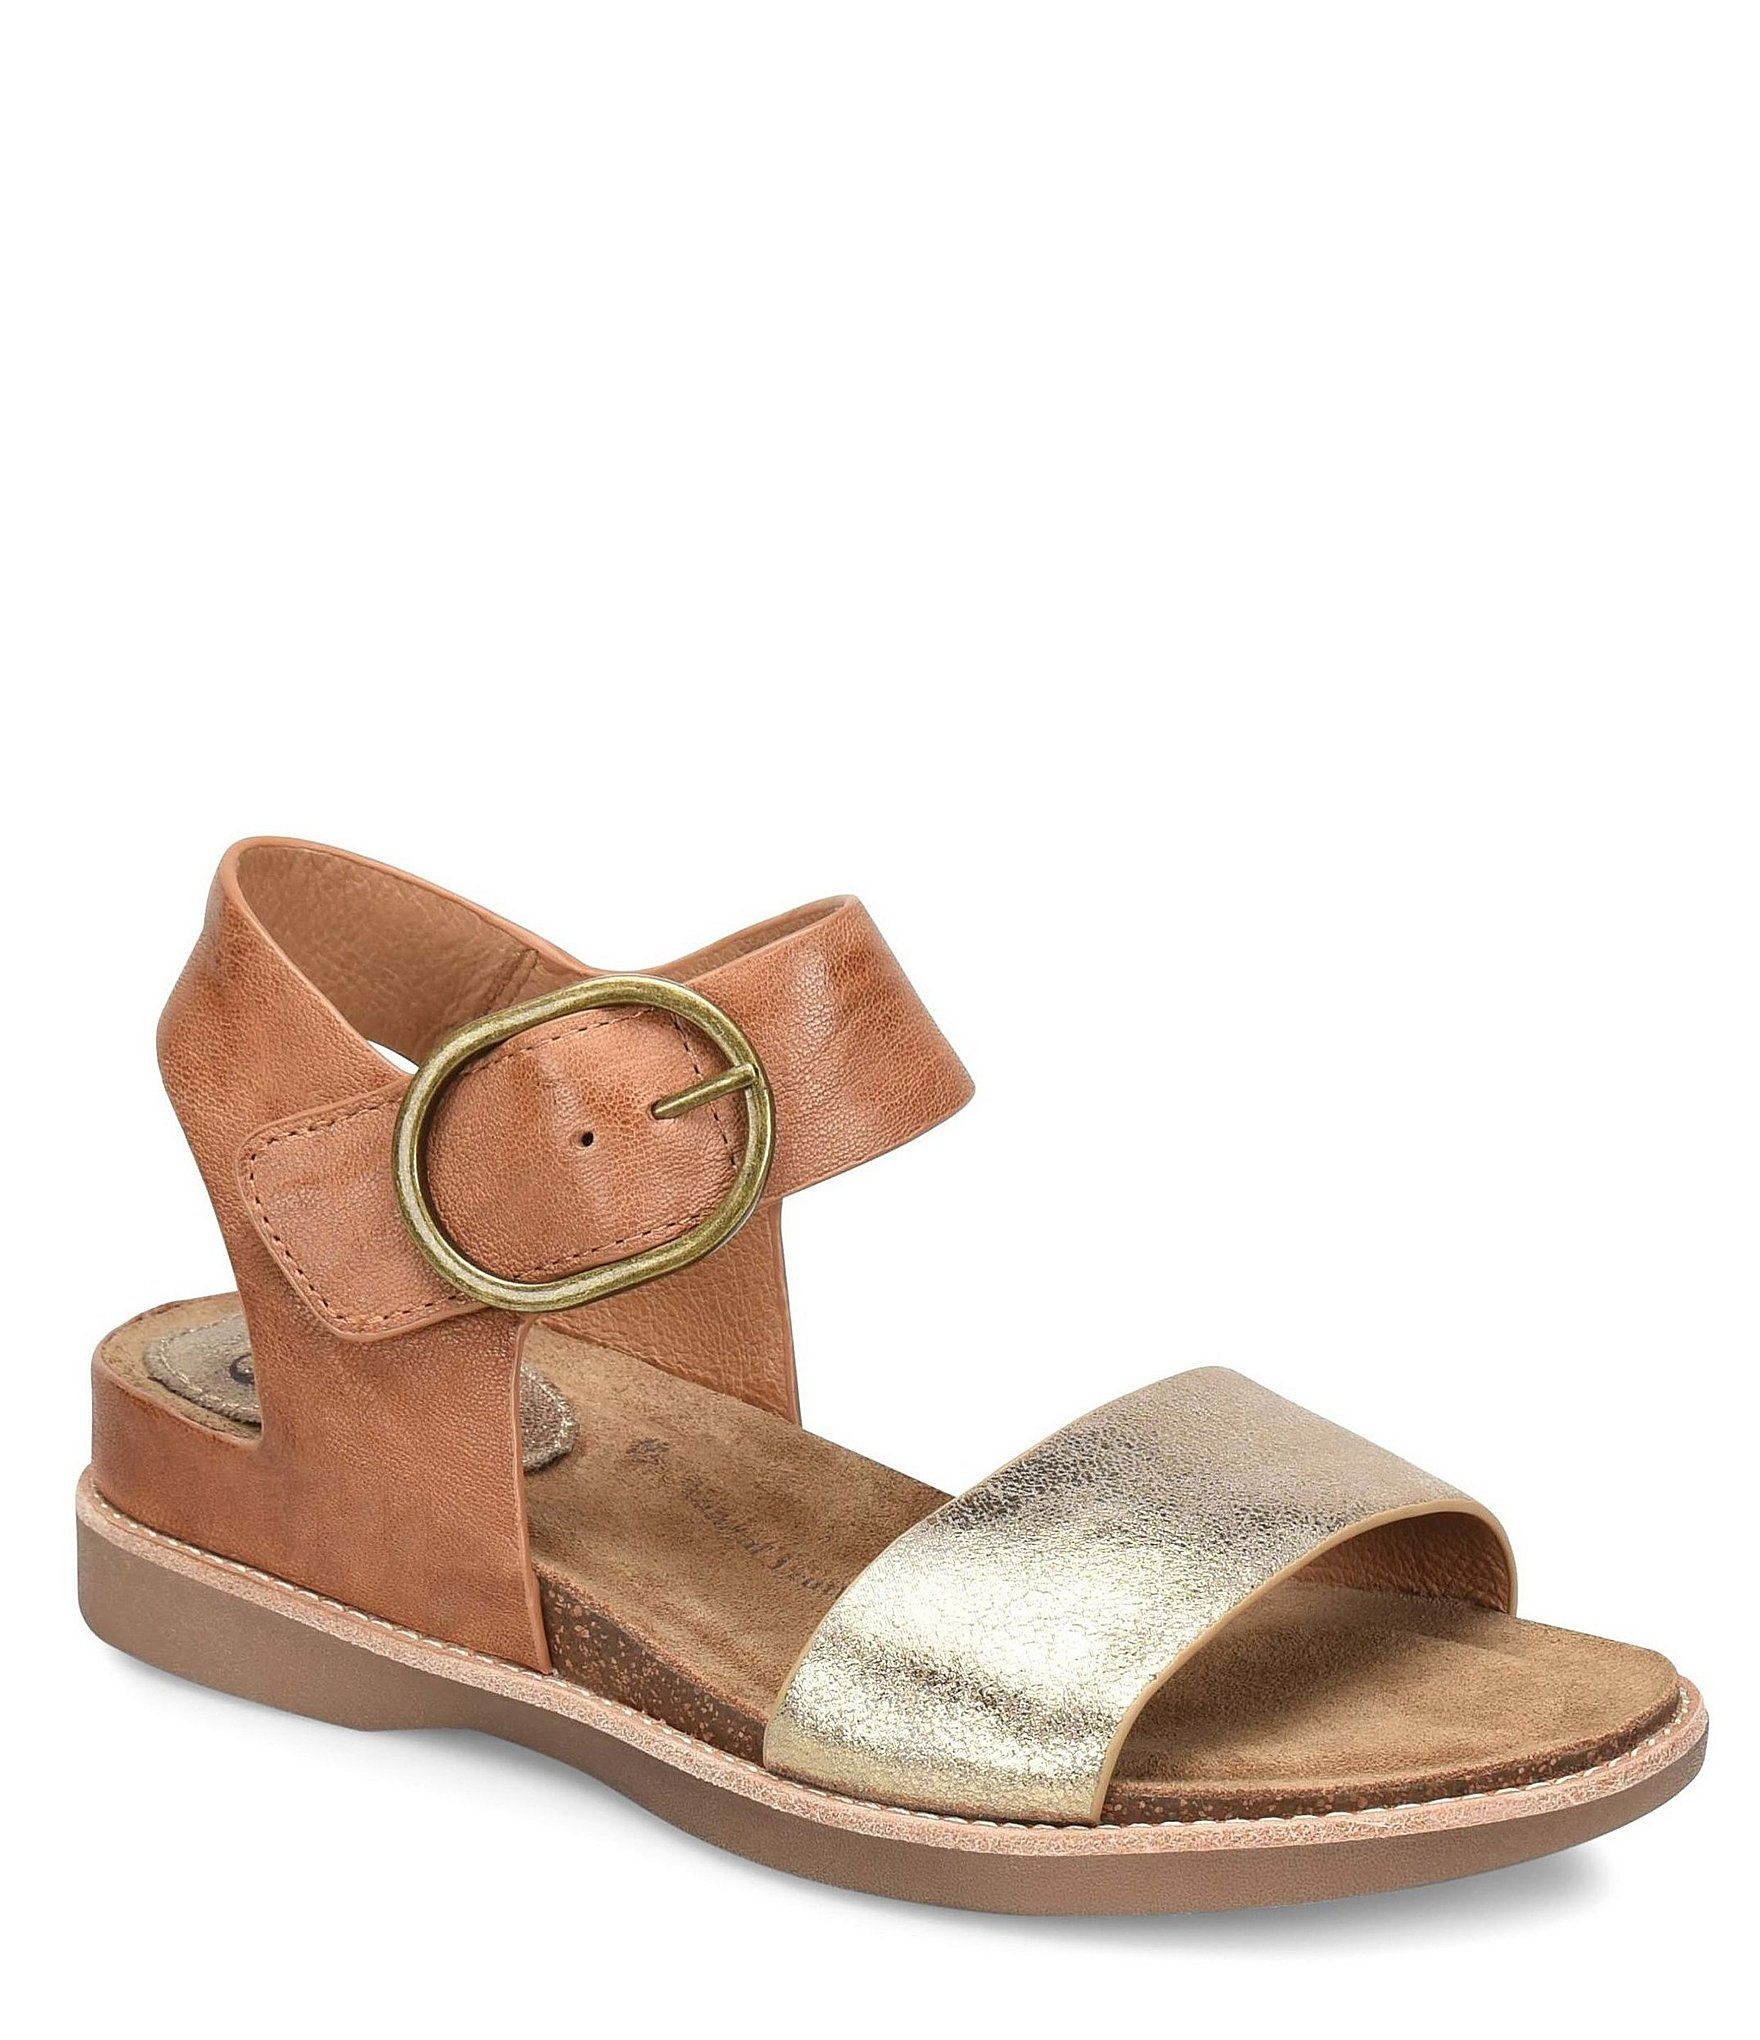 Sofft Bali Metallic Leather Sandals | Dillard's